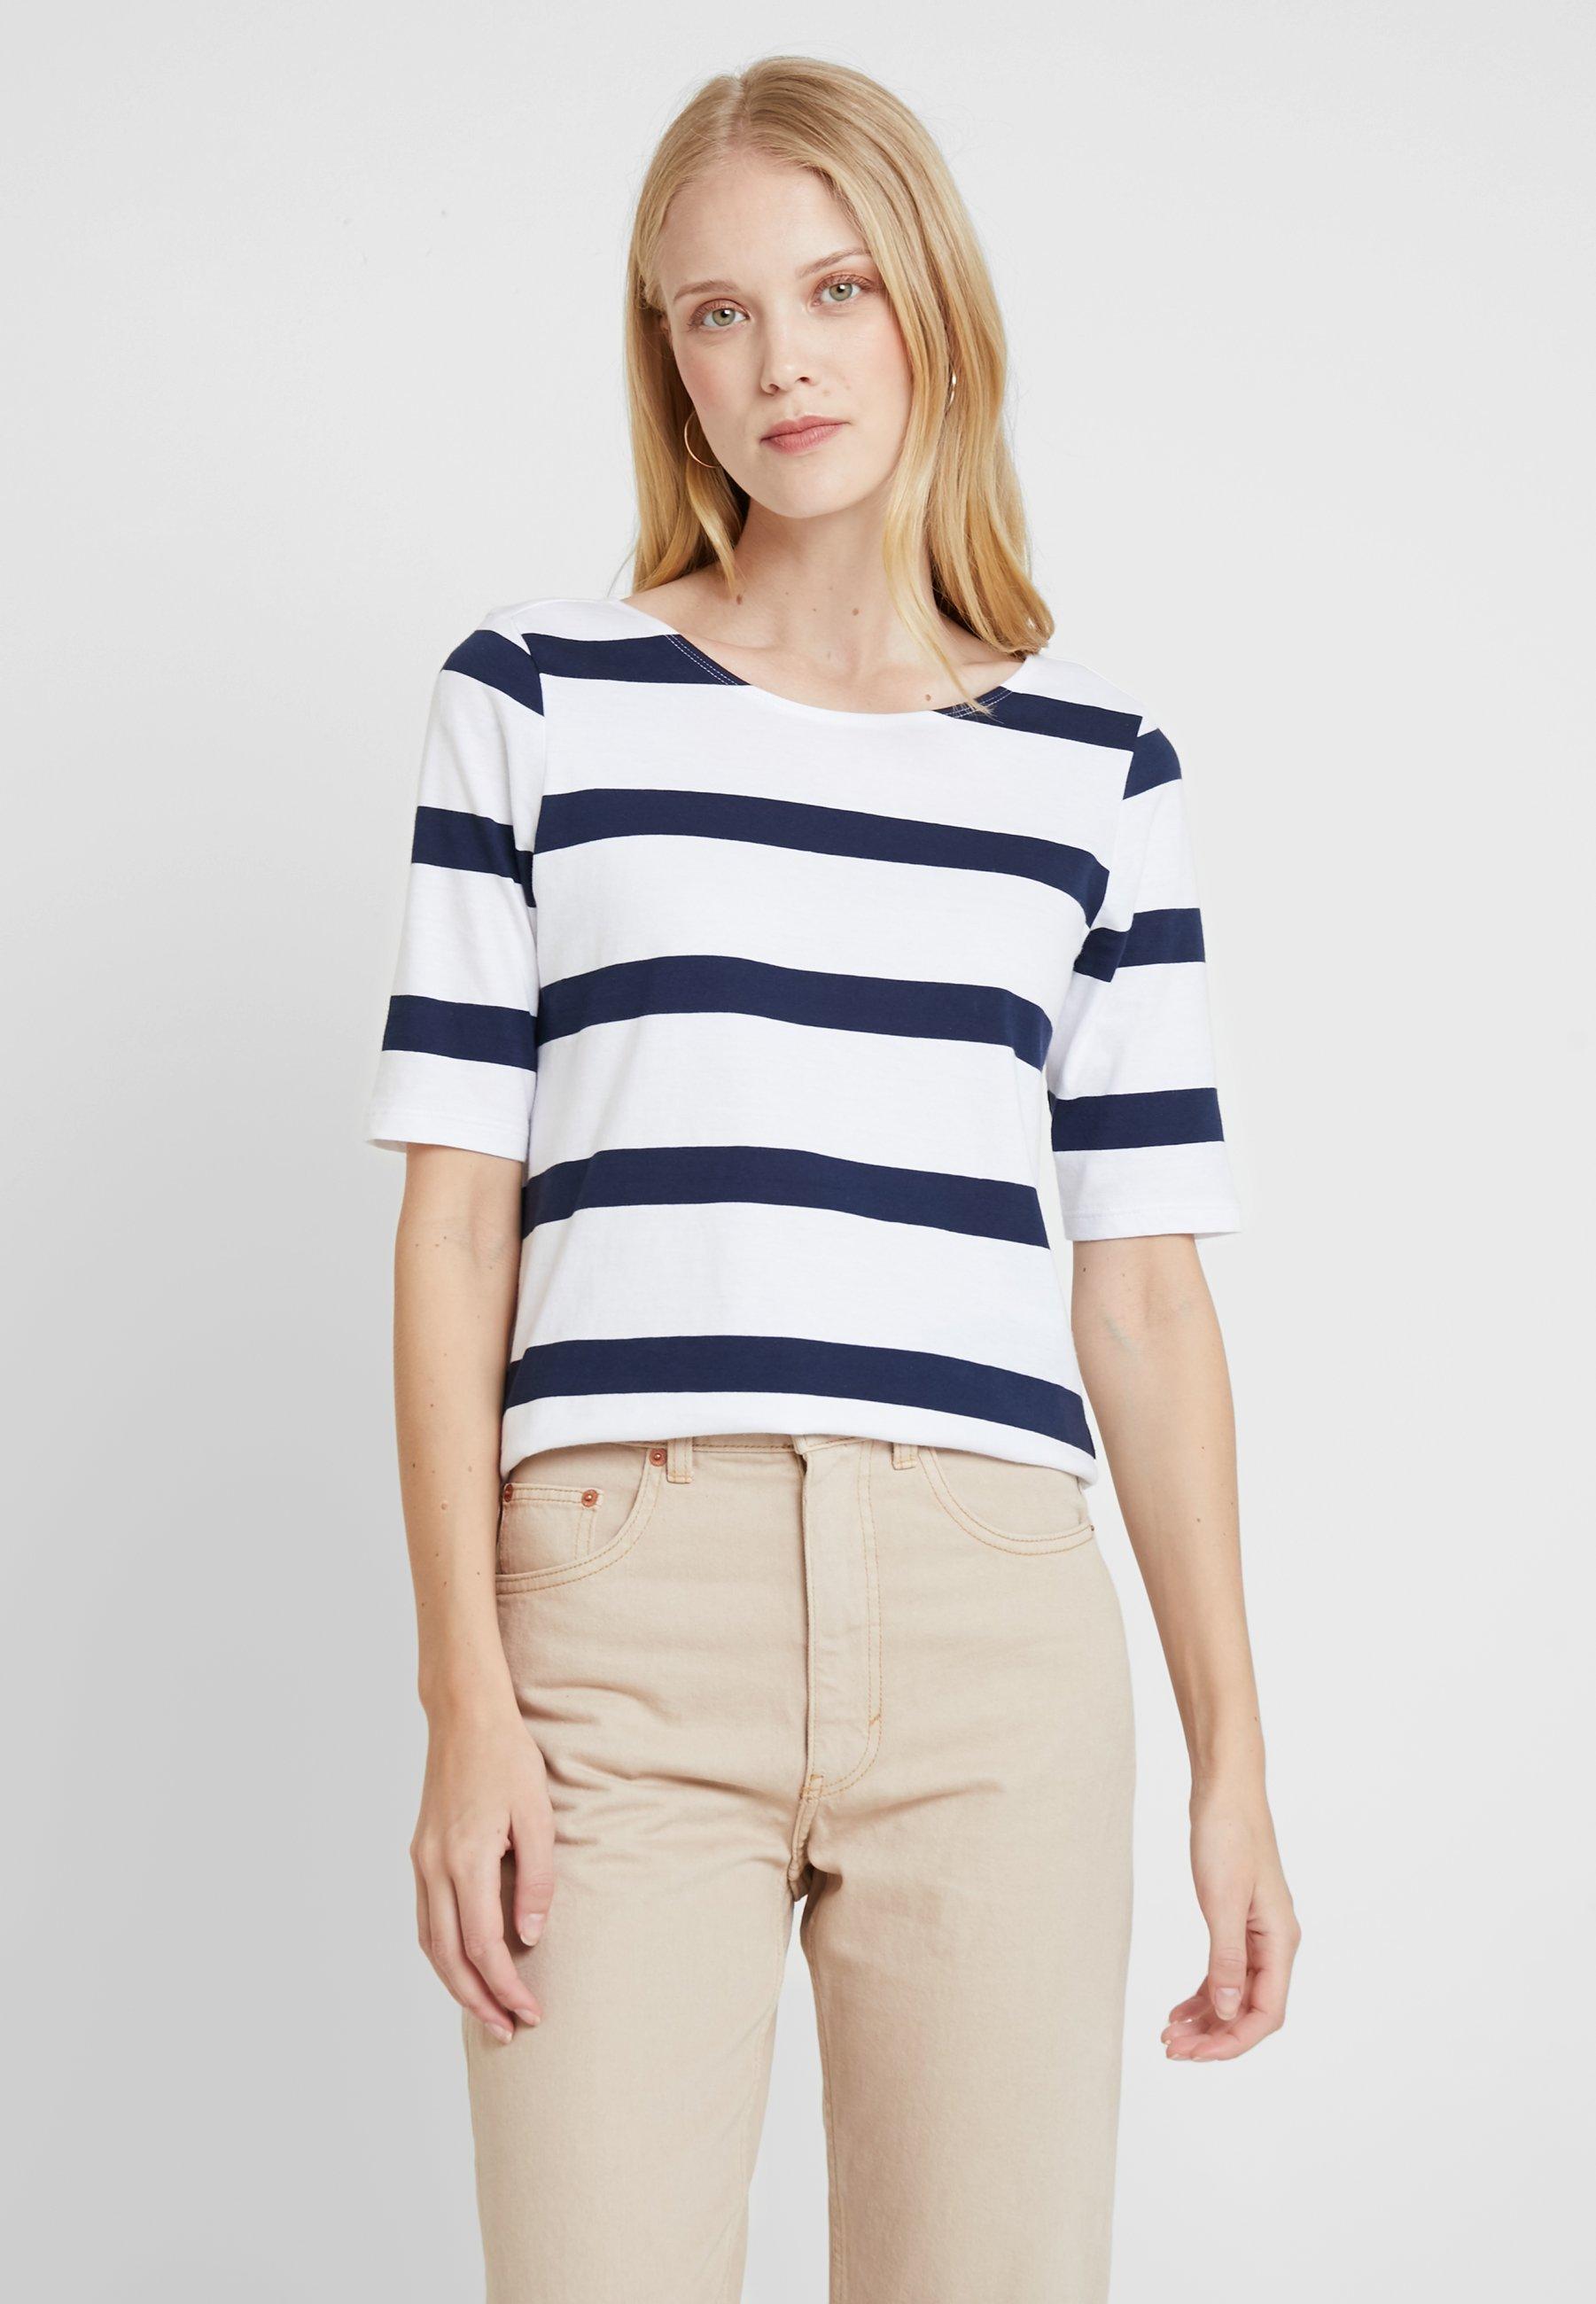 By Esprit Imprimé shirt BackT Navy Edc Strap e2bWIDHYE9